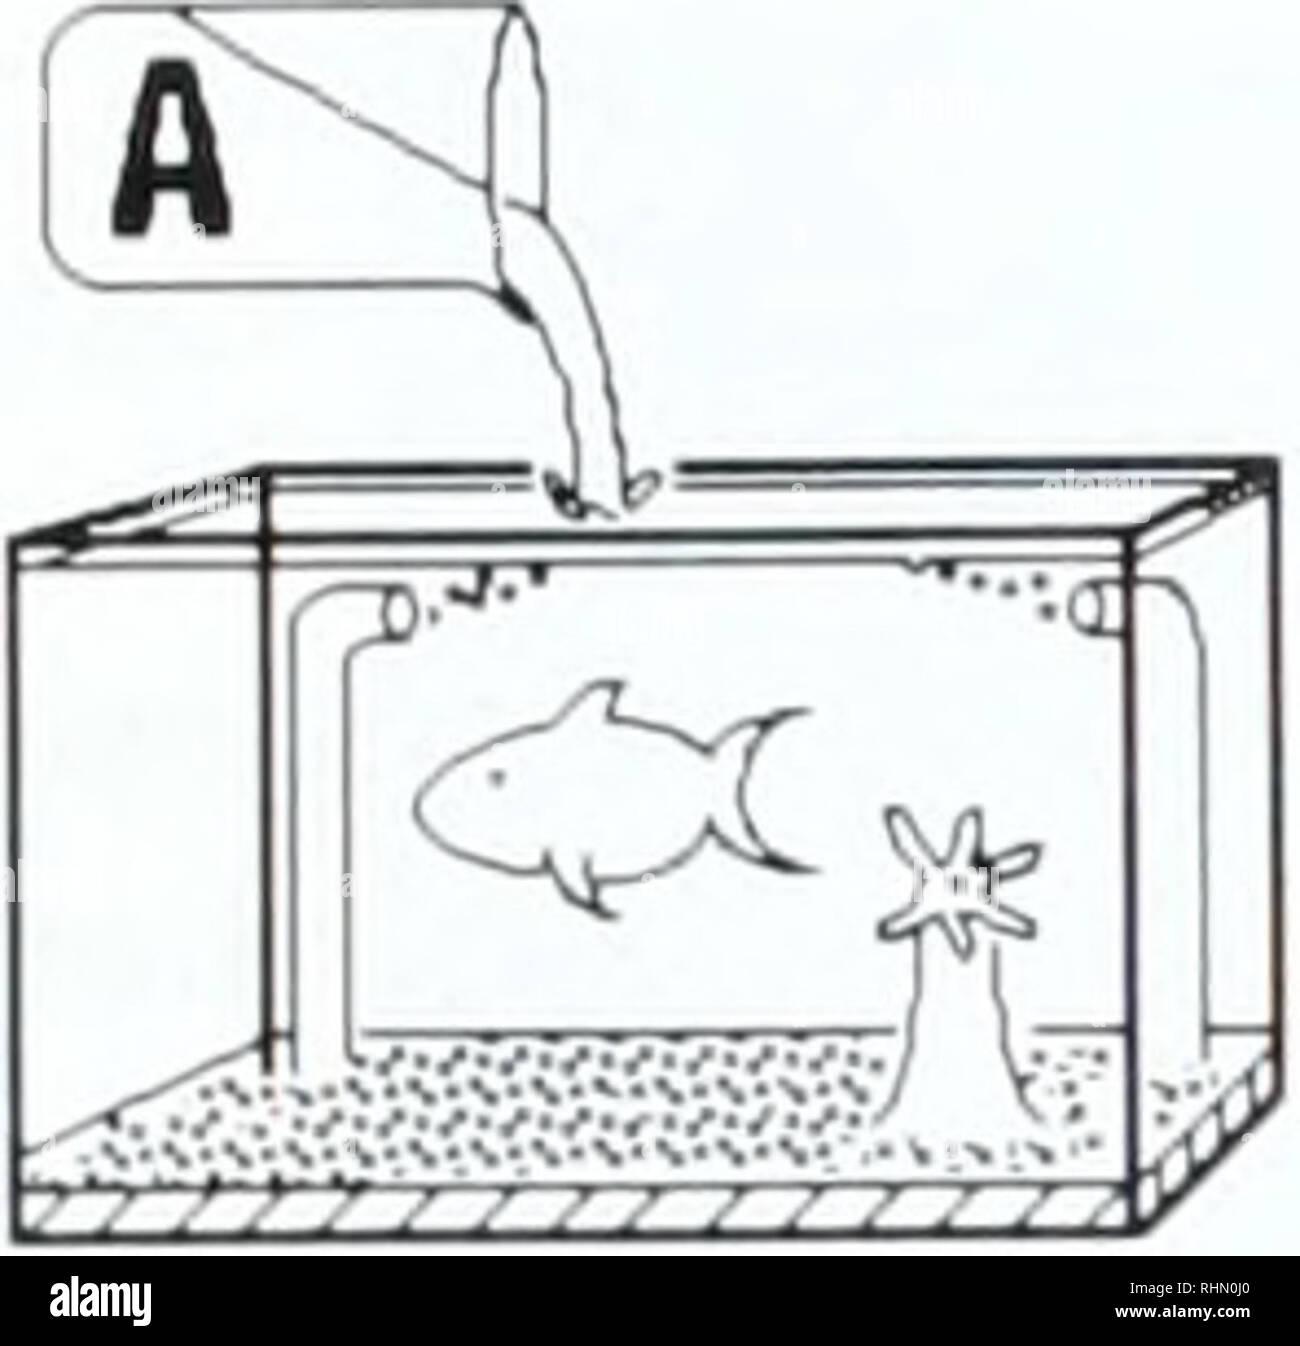 hight resolution of  the biological bulletin biology zoology biology marine biology inland culture of a nudibranch 245 b vacuum mfsa l i d i aftu juvenile larval